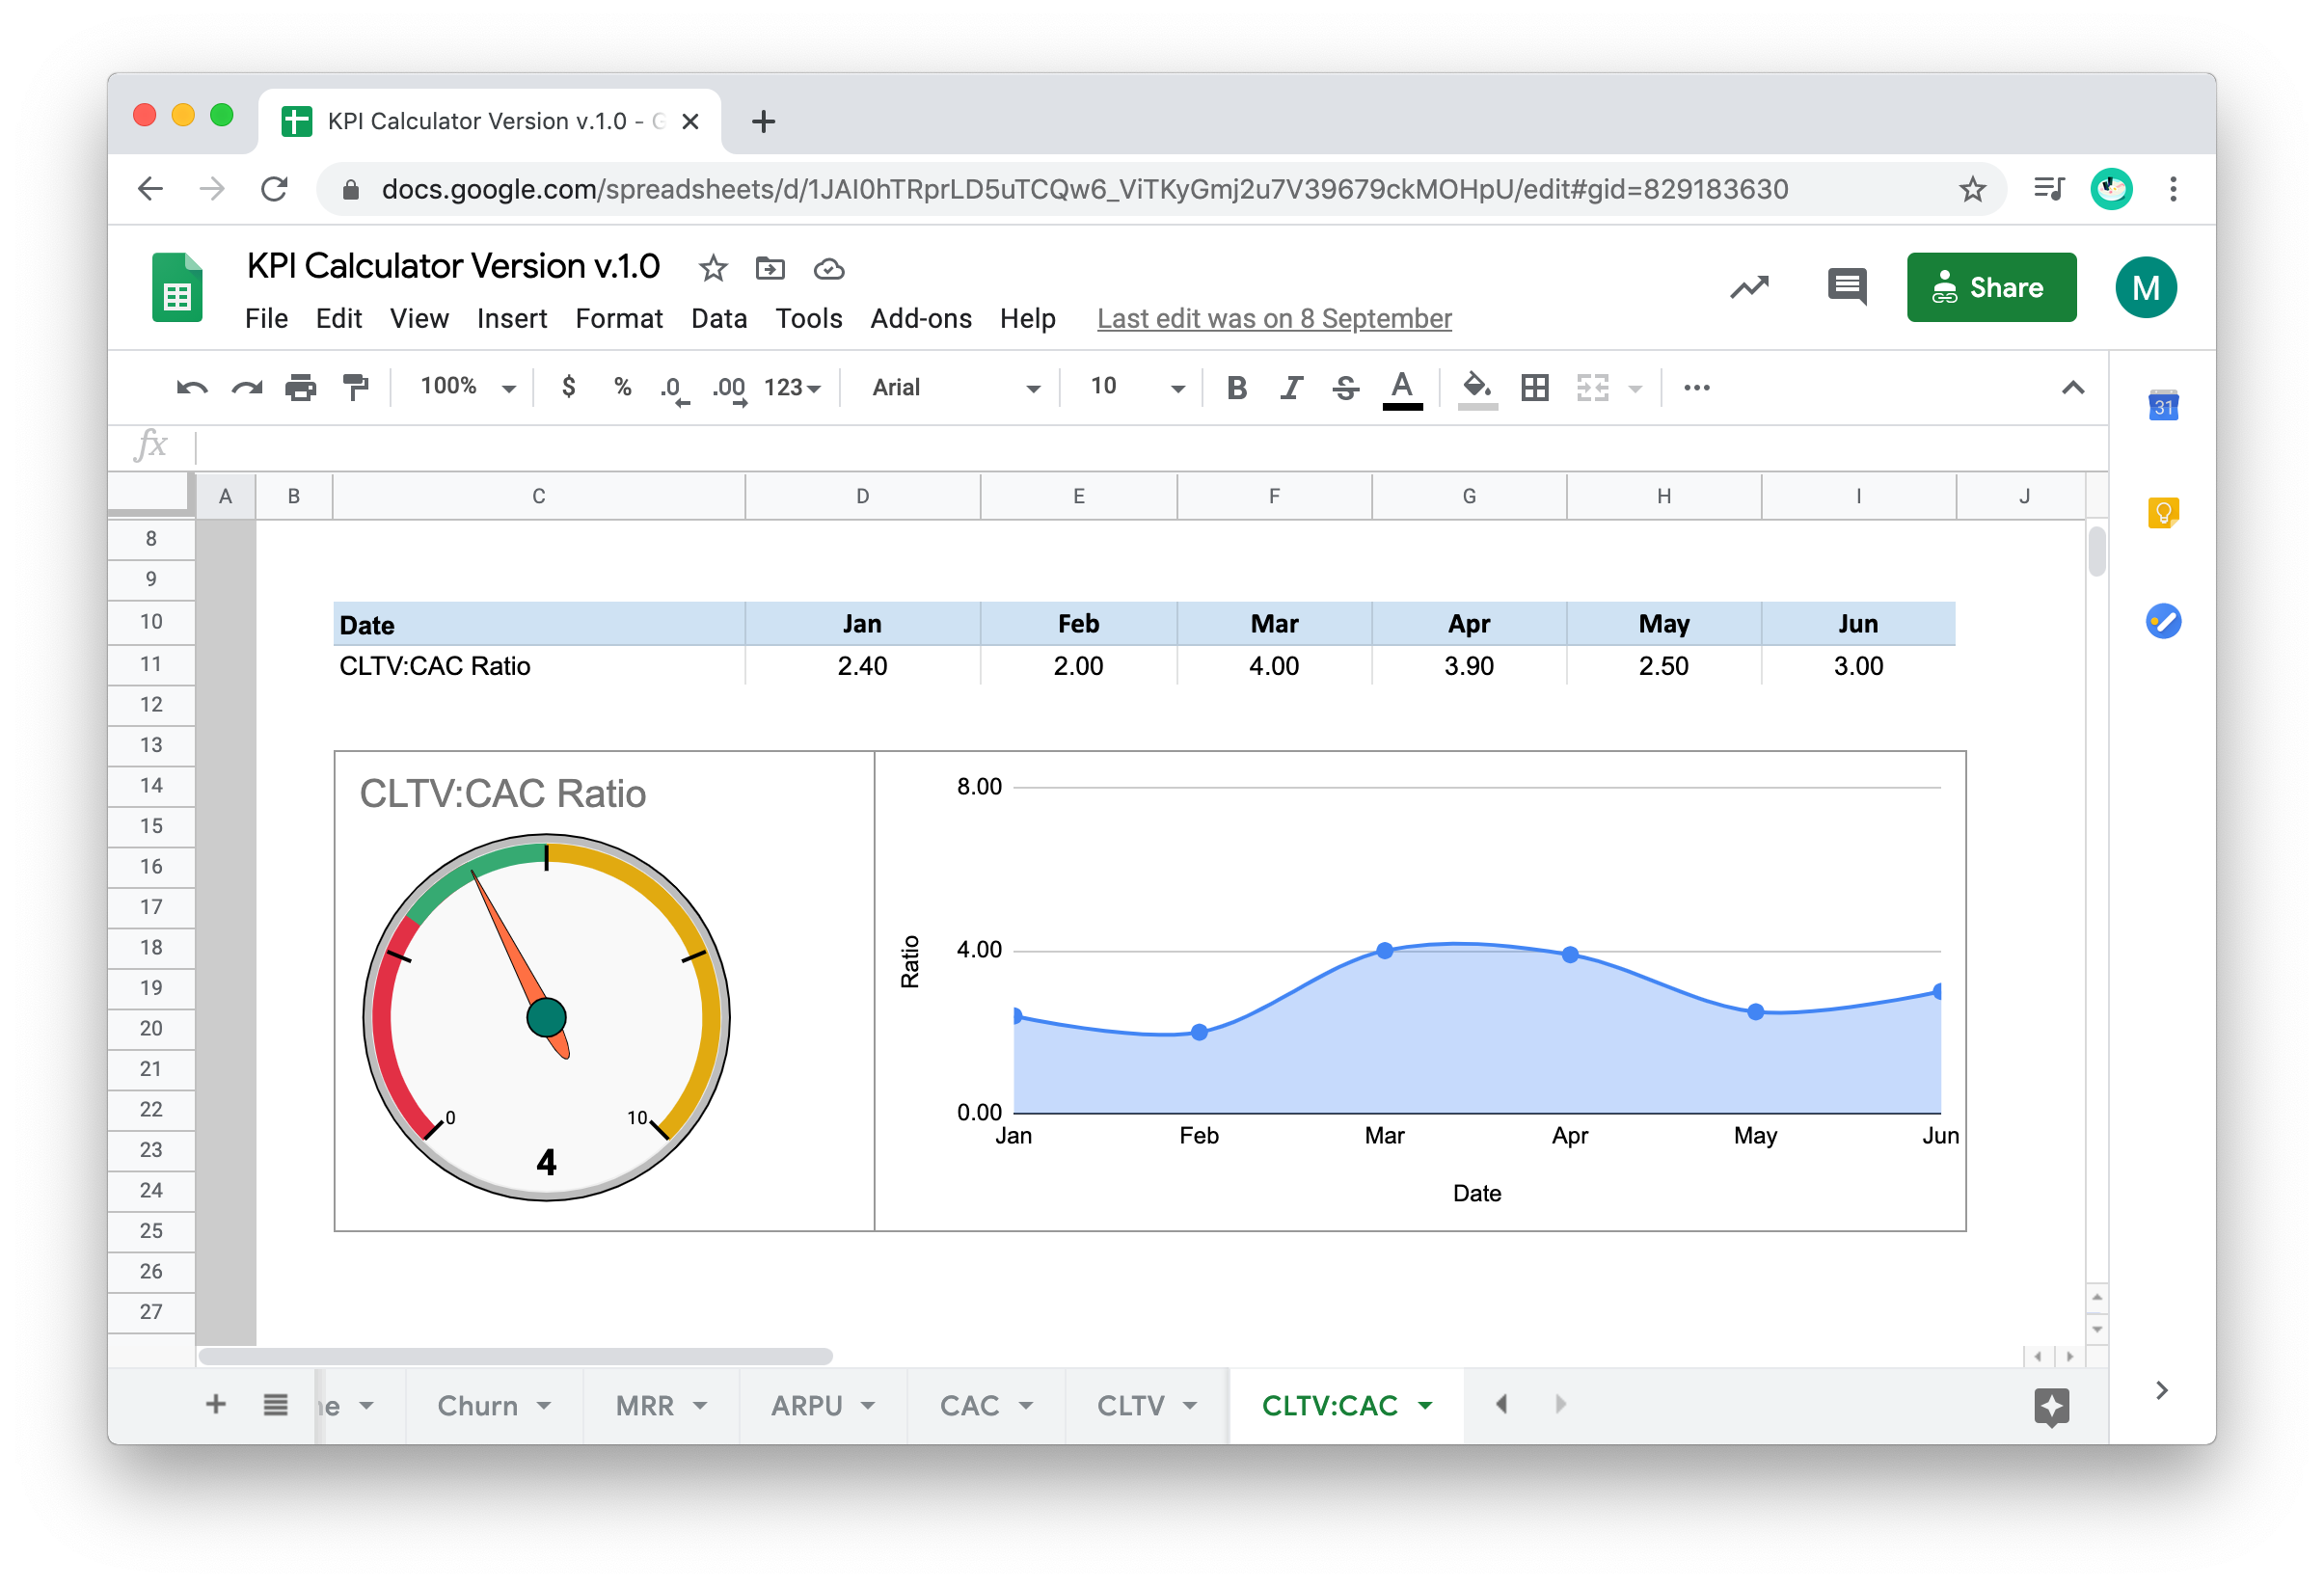 KPI Calculator Version v.1.0 - Google Sheets 2020-11-03 20-21-59